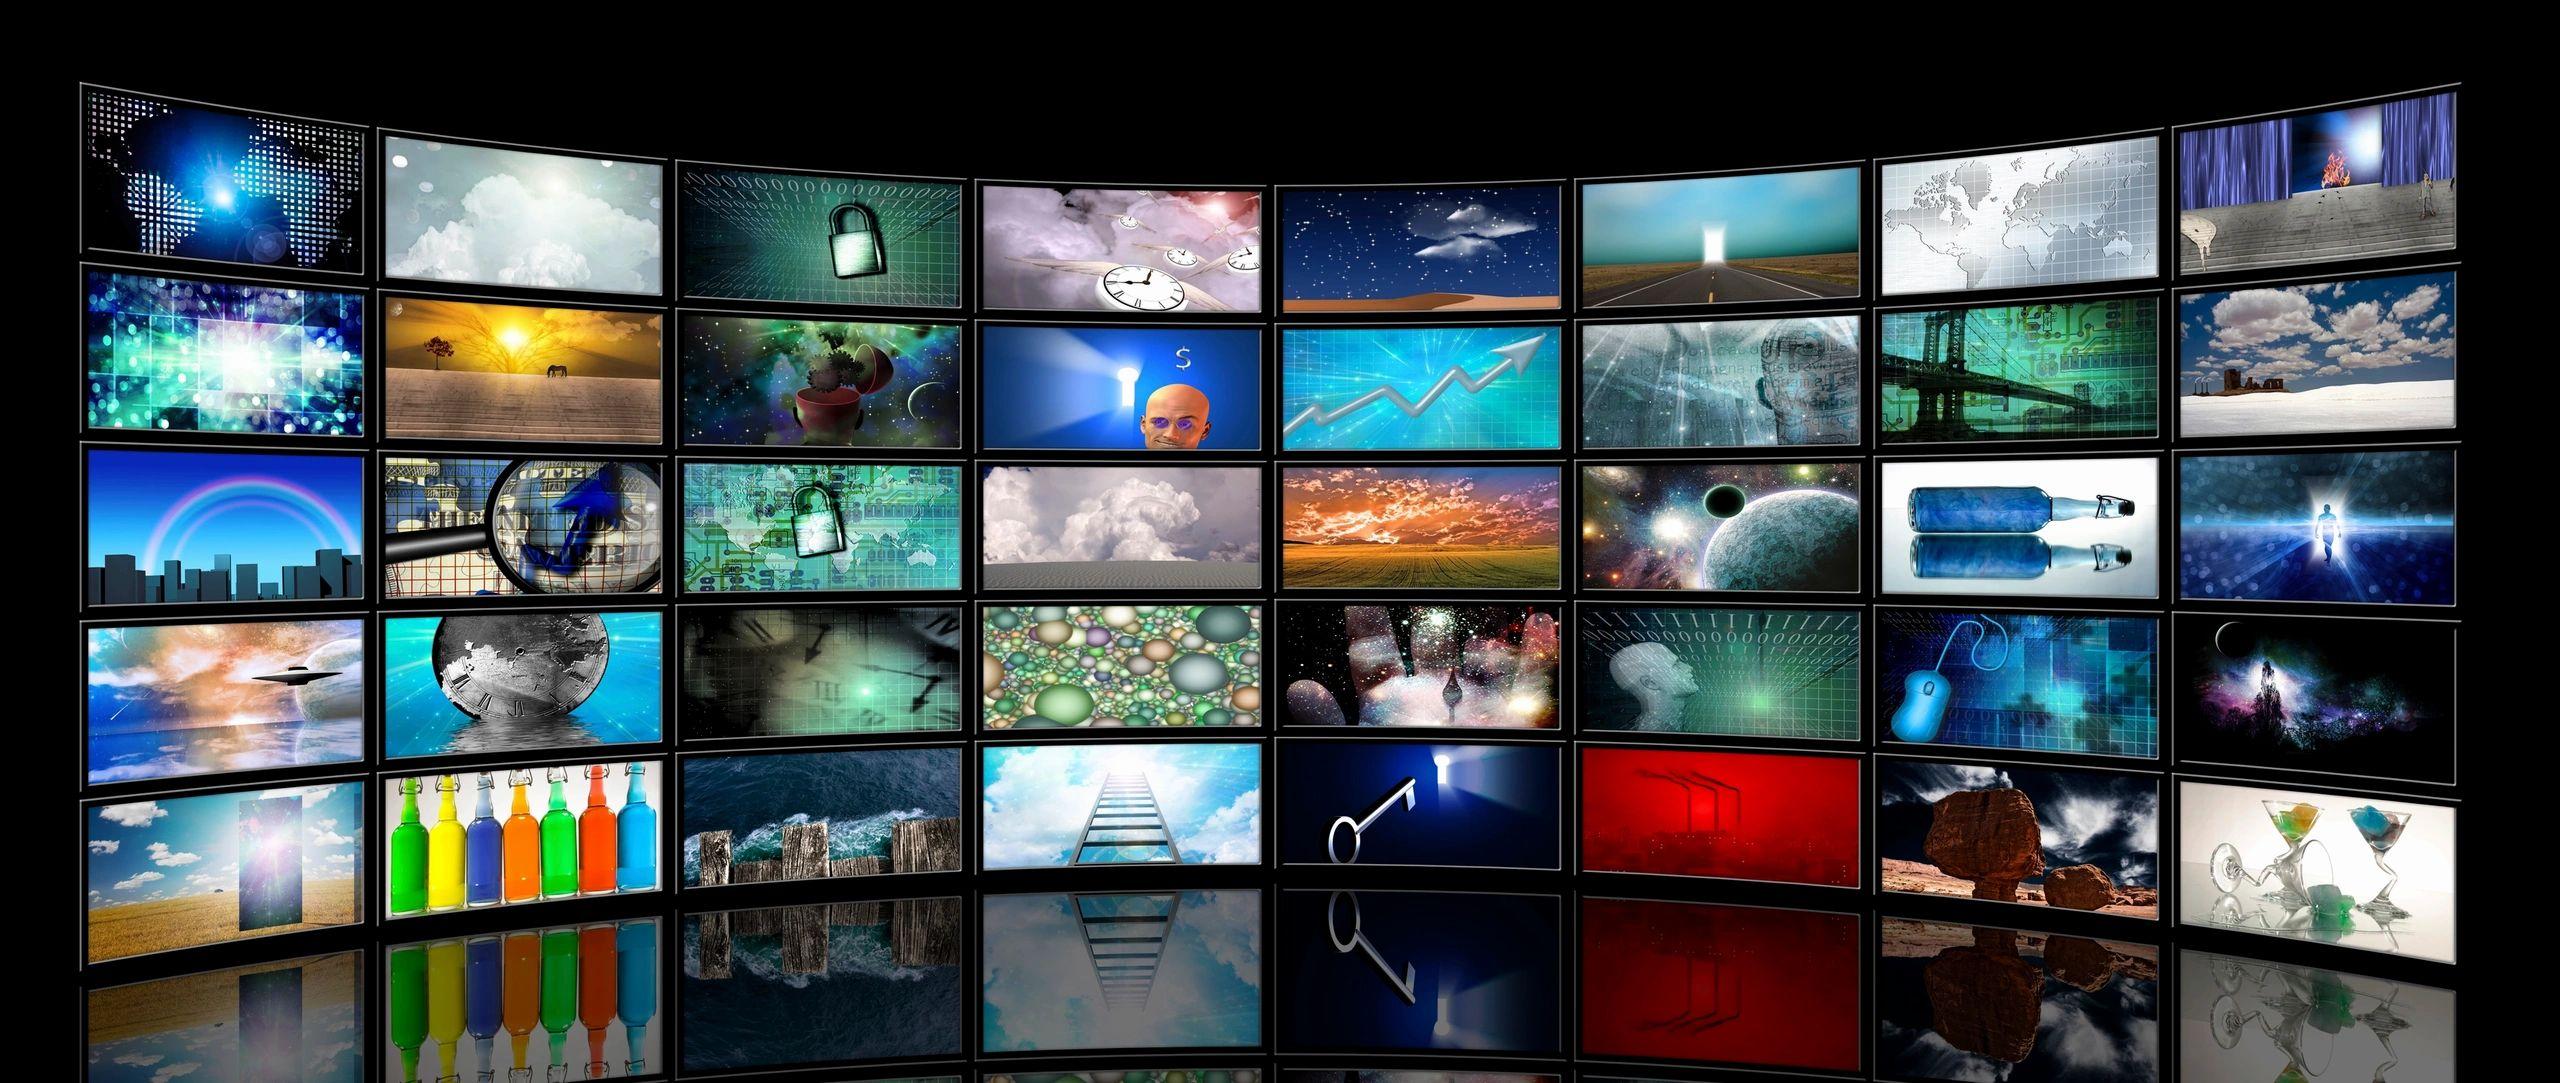 Myiptvworld - IPTV Subscription, Iptv Subscription, Best Iptv, Iptv